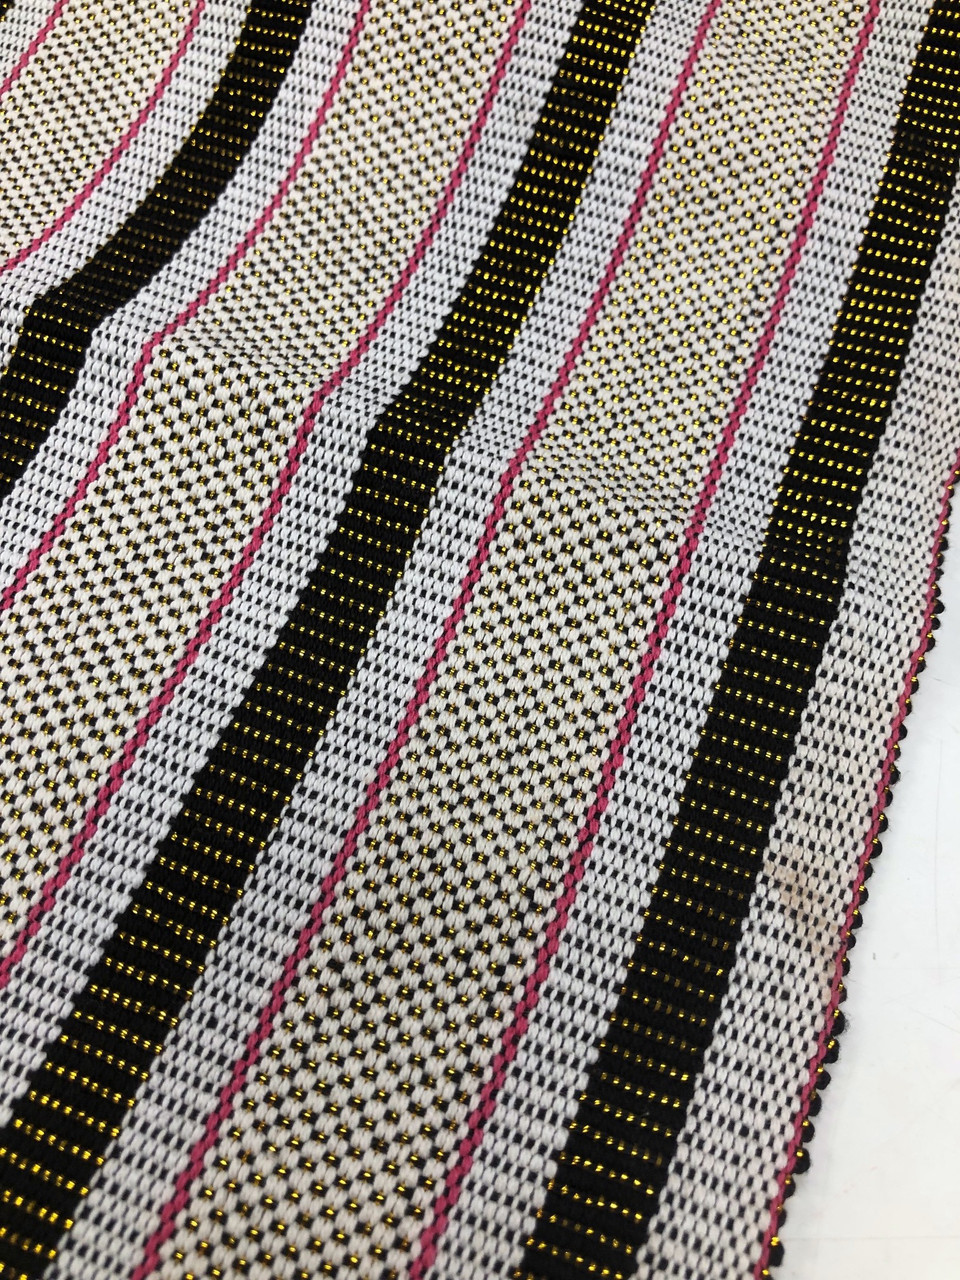 "African Faso Dan Fani Handmade Woven Gold Metallic Cotton Fabric 12"" x 3 yds"